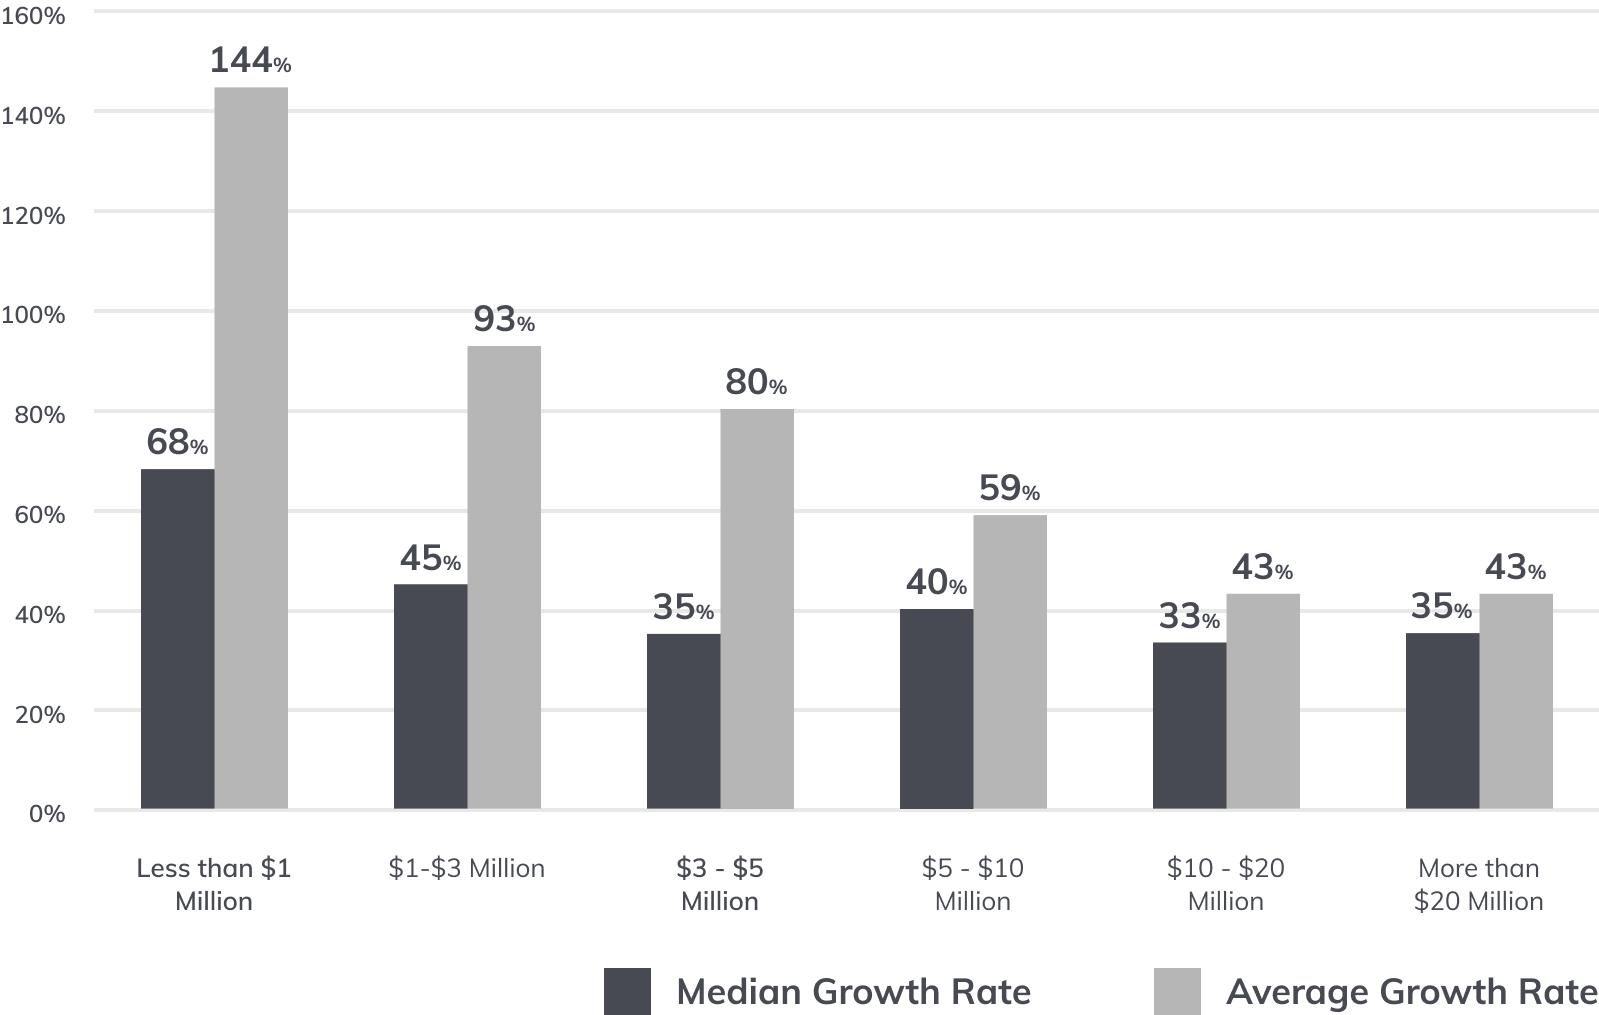 B2B SaaS Growth Rates for various B2B SaaS Marketing Strategies